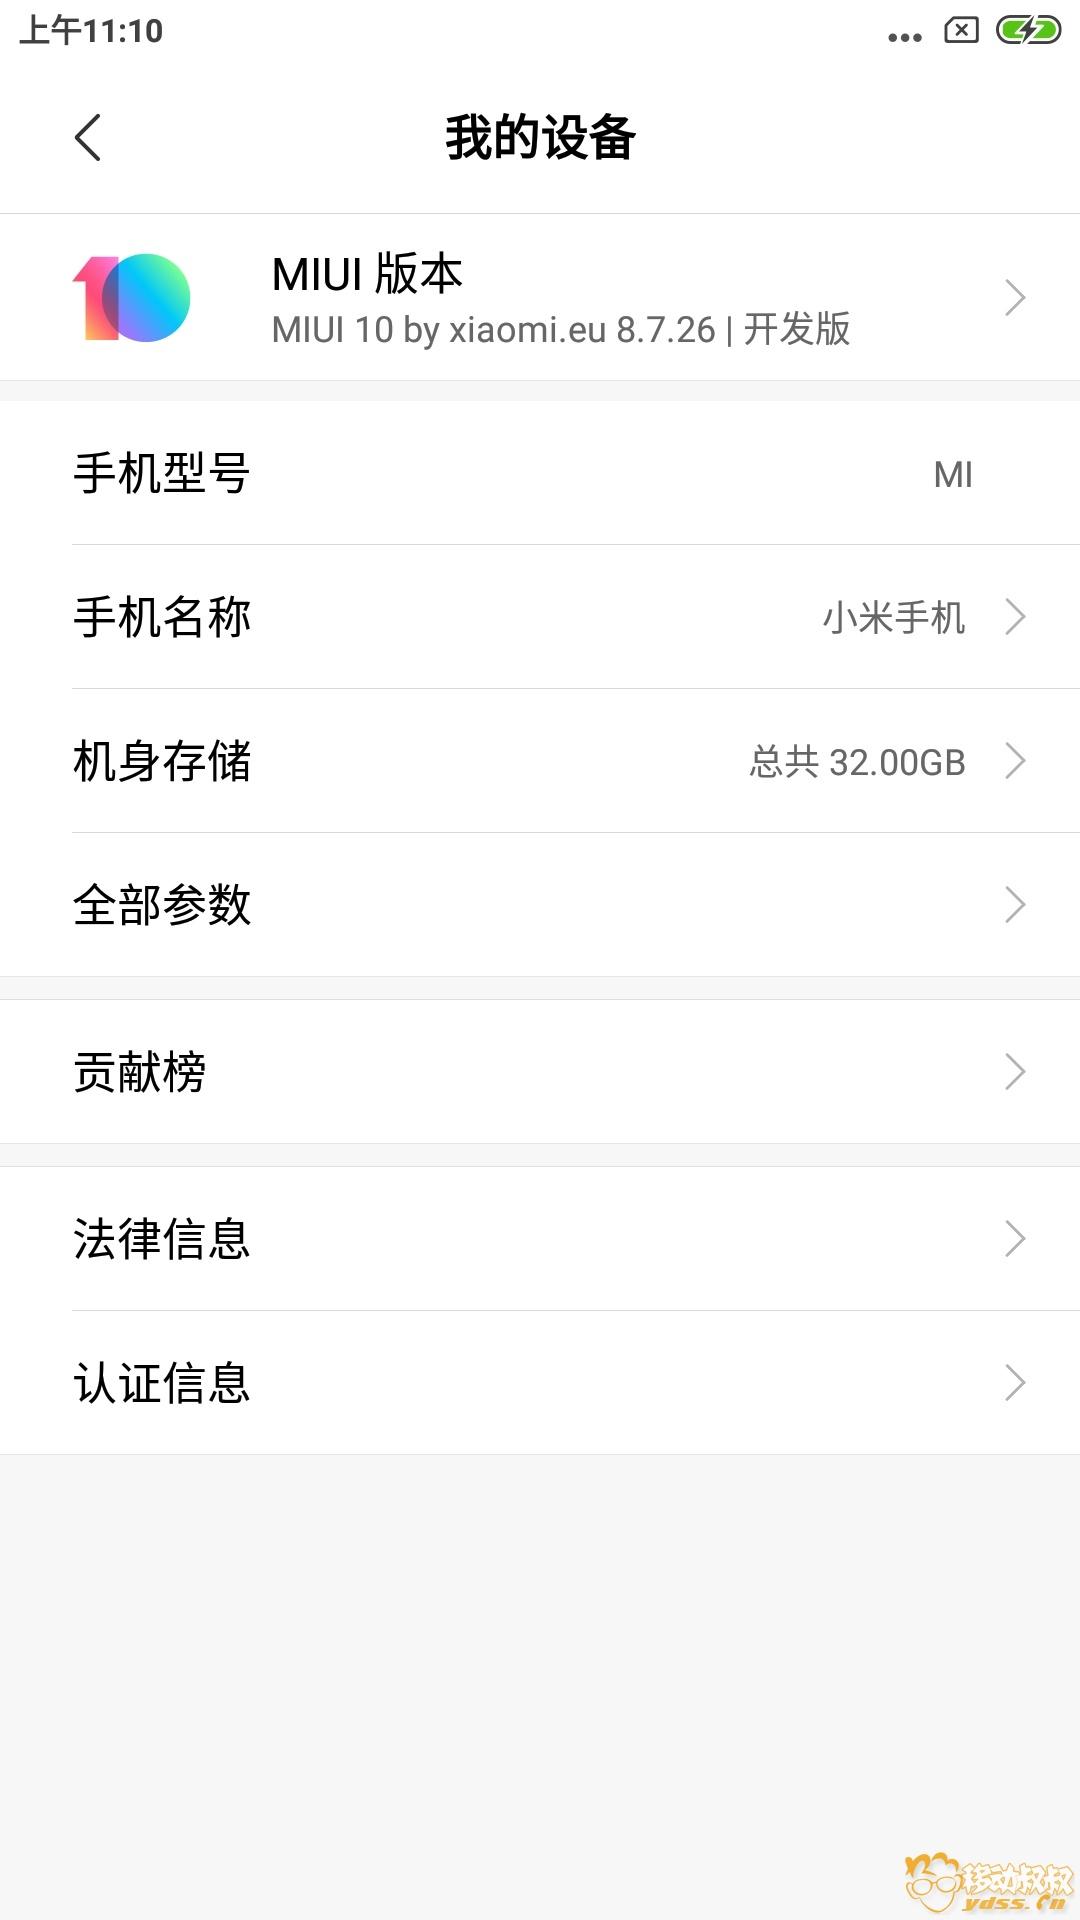 InkedScreenshot_1970-12-12-11-10-15-463_com.android.settings_LI.jpg